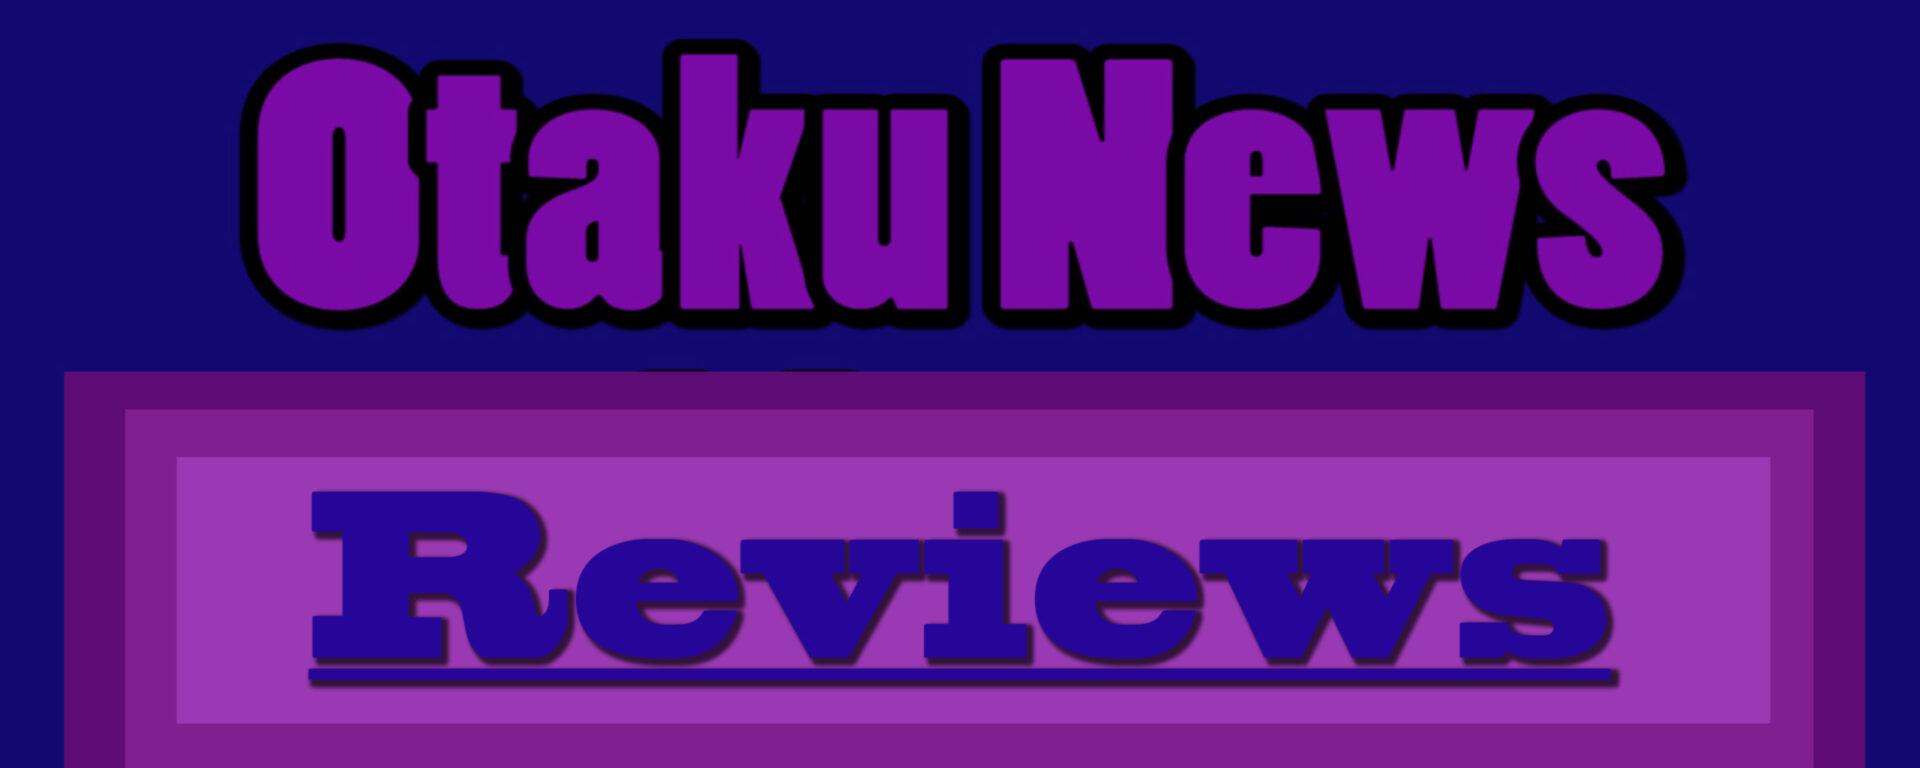 Restart Again Volume 1 by Adam Ladner – Otaku News Reviews